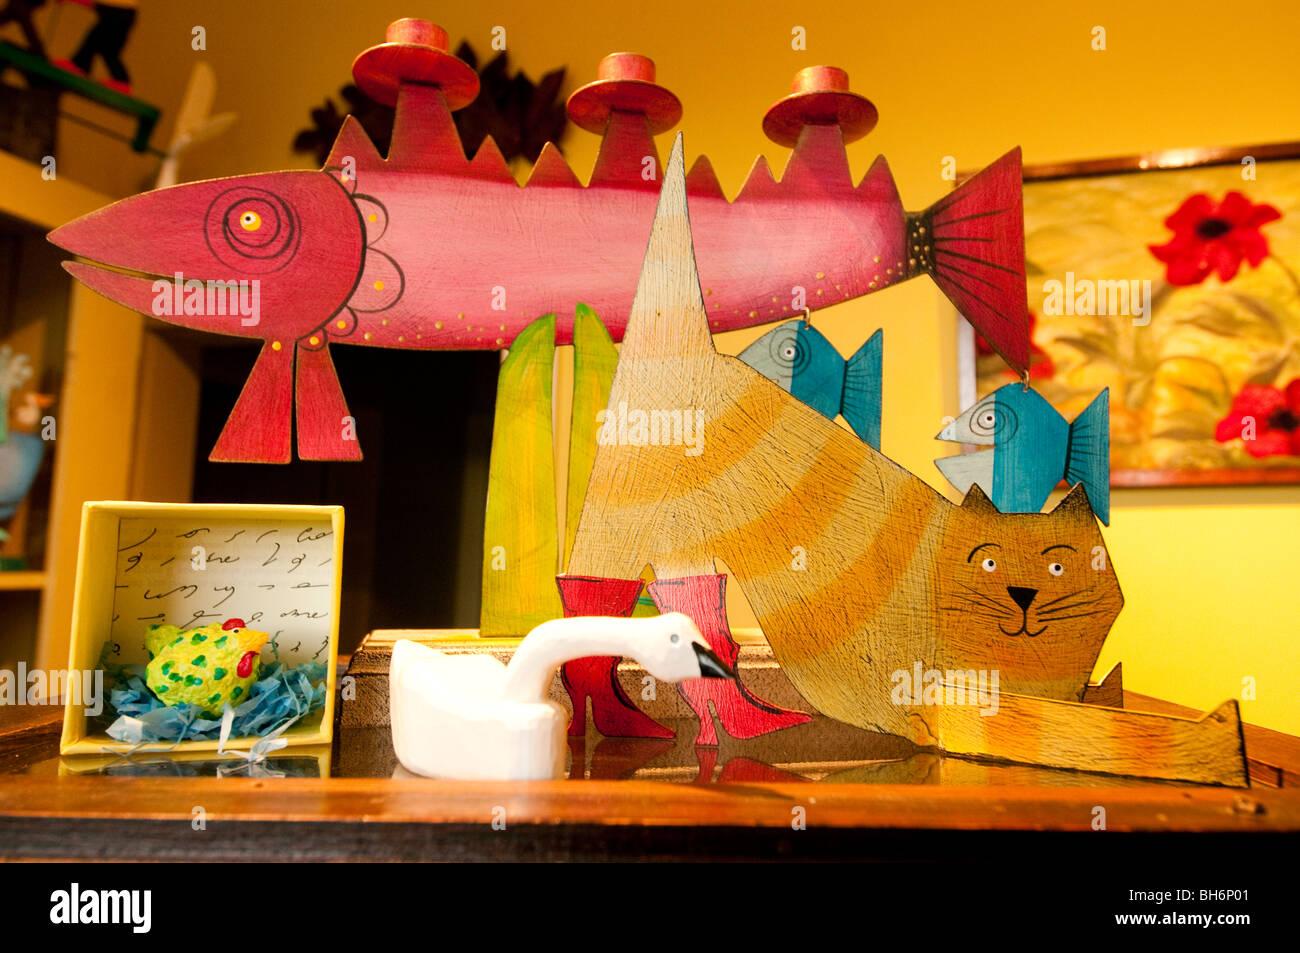 Nova Scotia, Annapolis Royal, Shopping, Catfish Moon Crafts & Pottery. - Stock Image